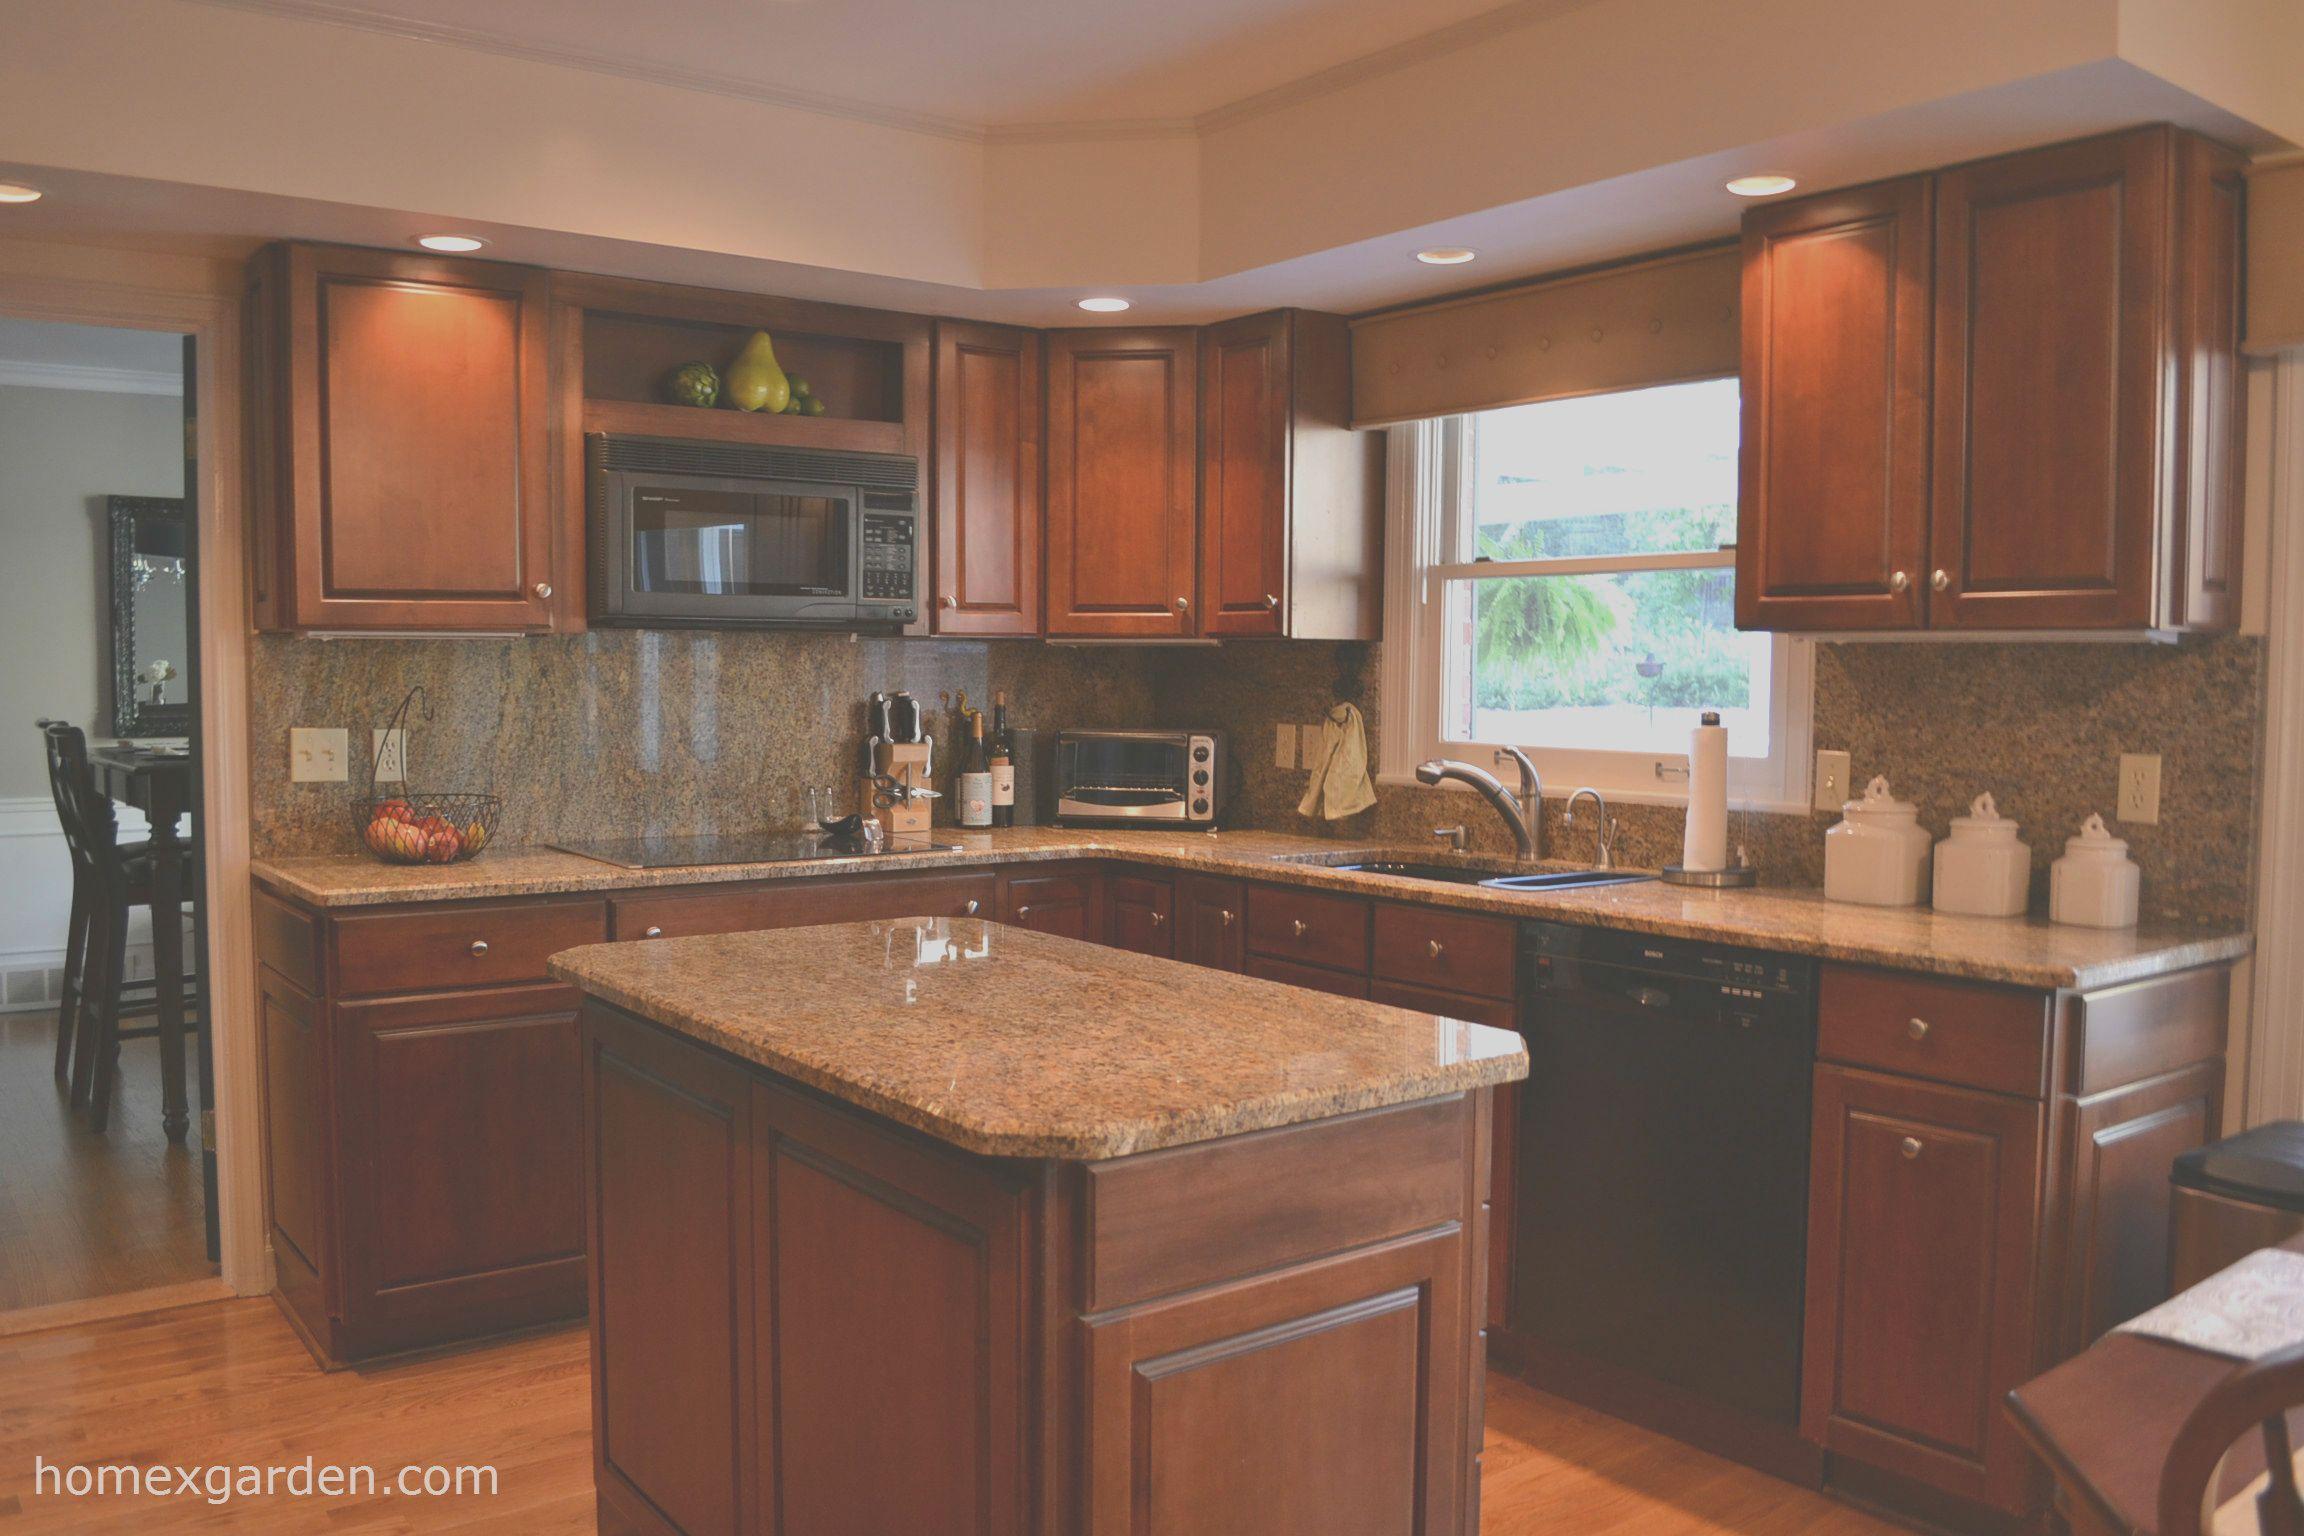 15 Casual Kitchen Ideas Cherry Cabinets Photography In 2020 Cherry Cabinets Kitchen Kitchen Accessories Decor Kitchen Design